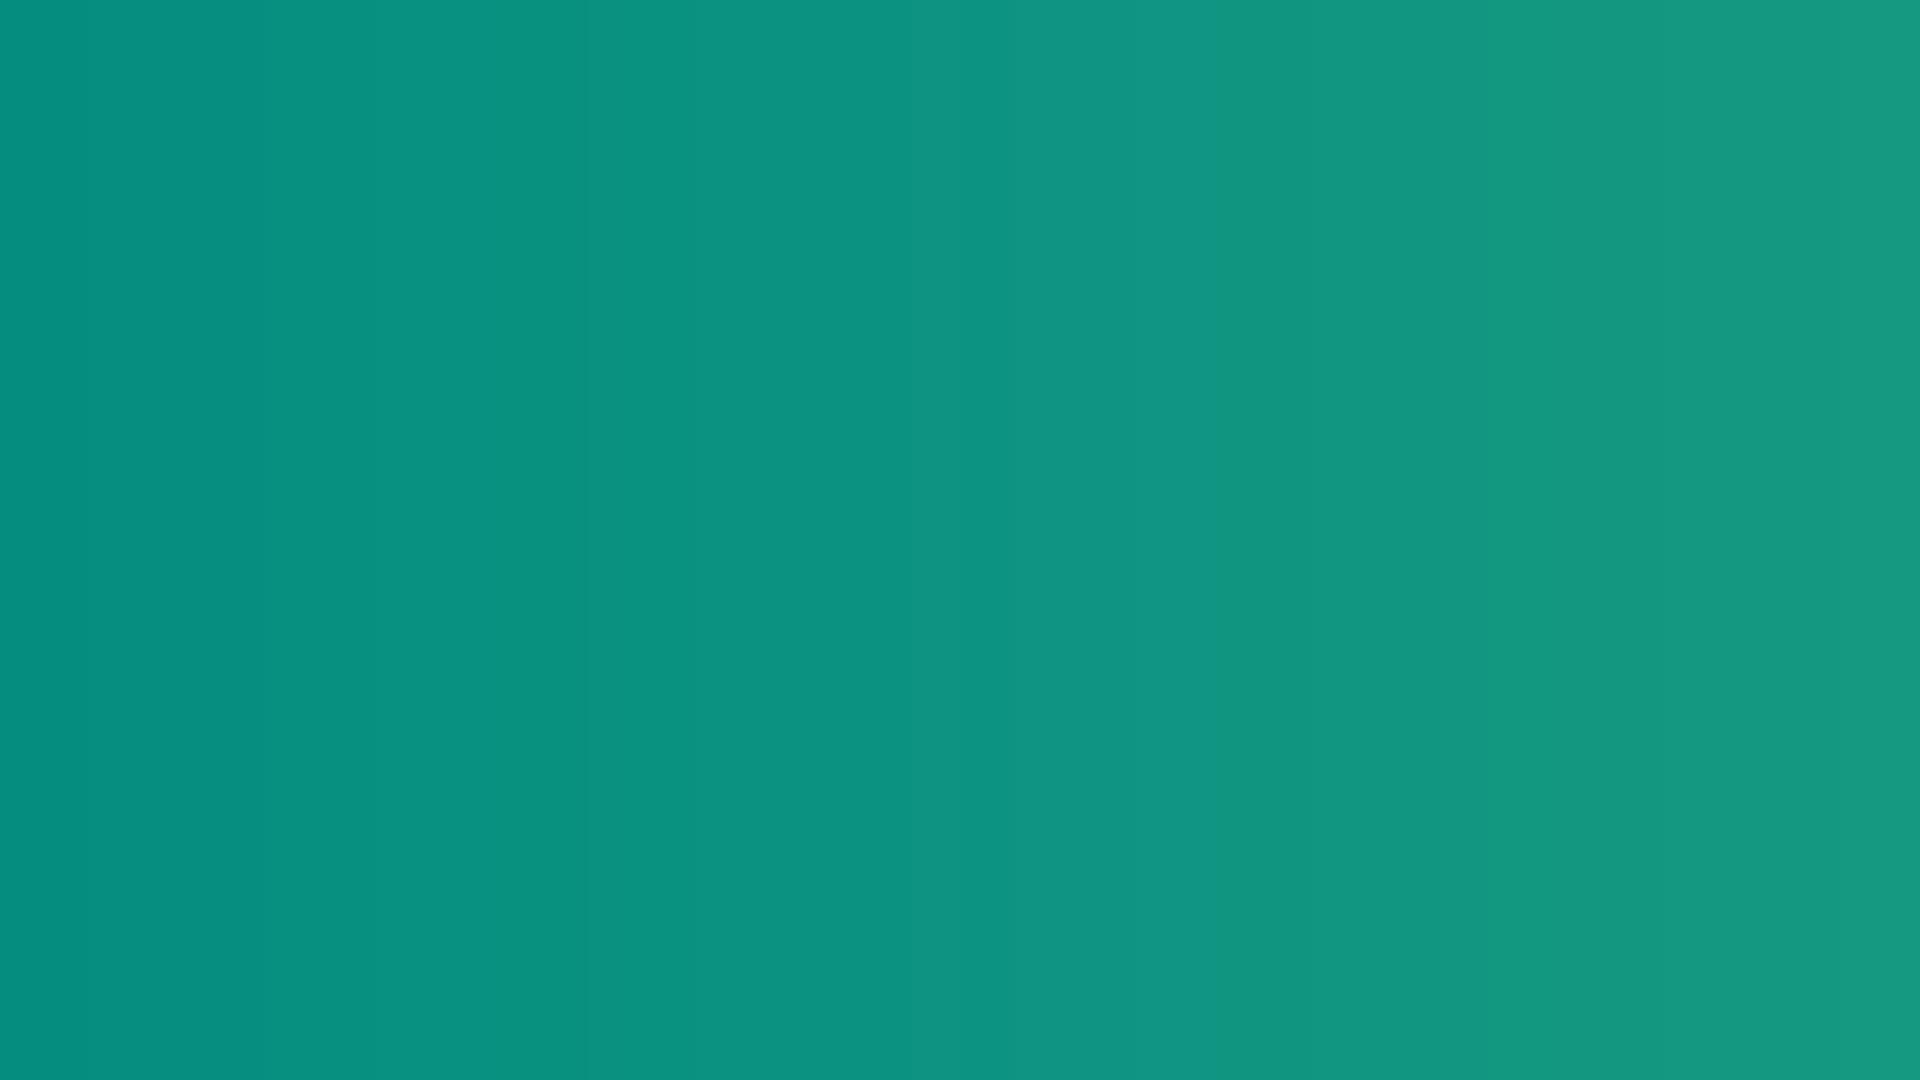 Dark green Gradient